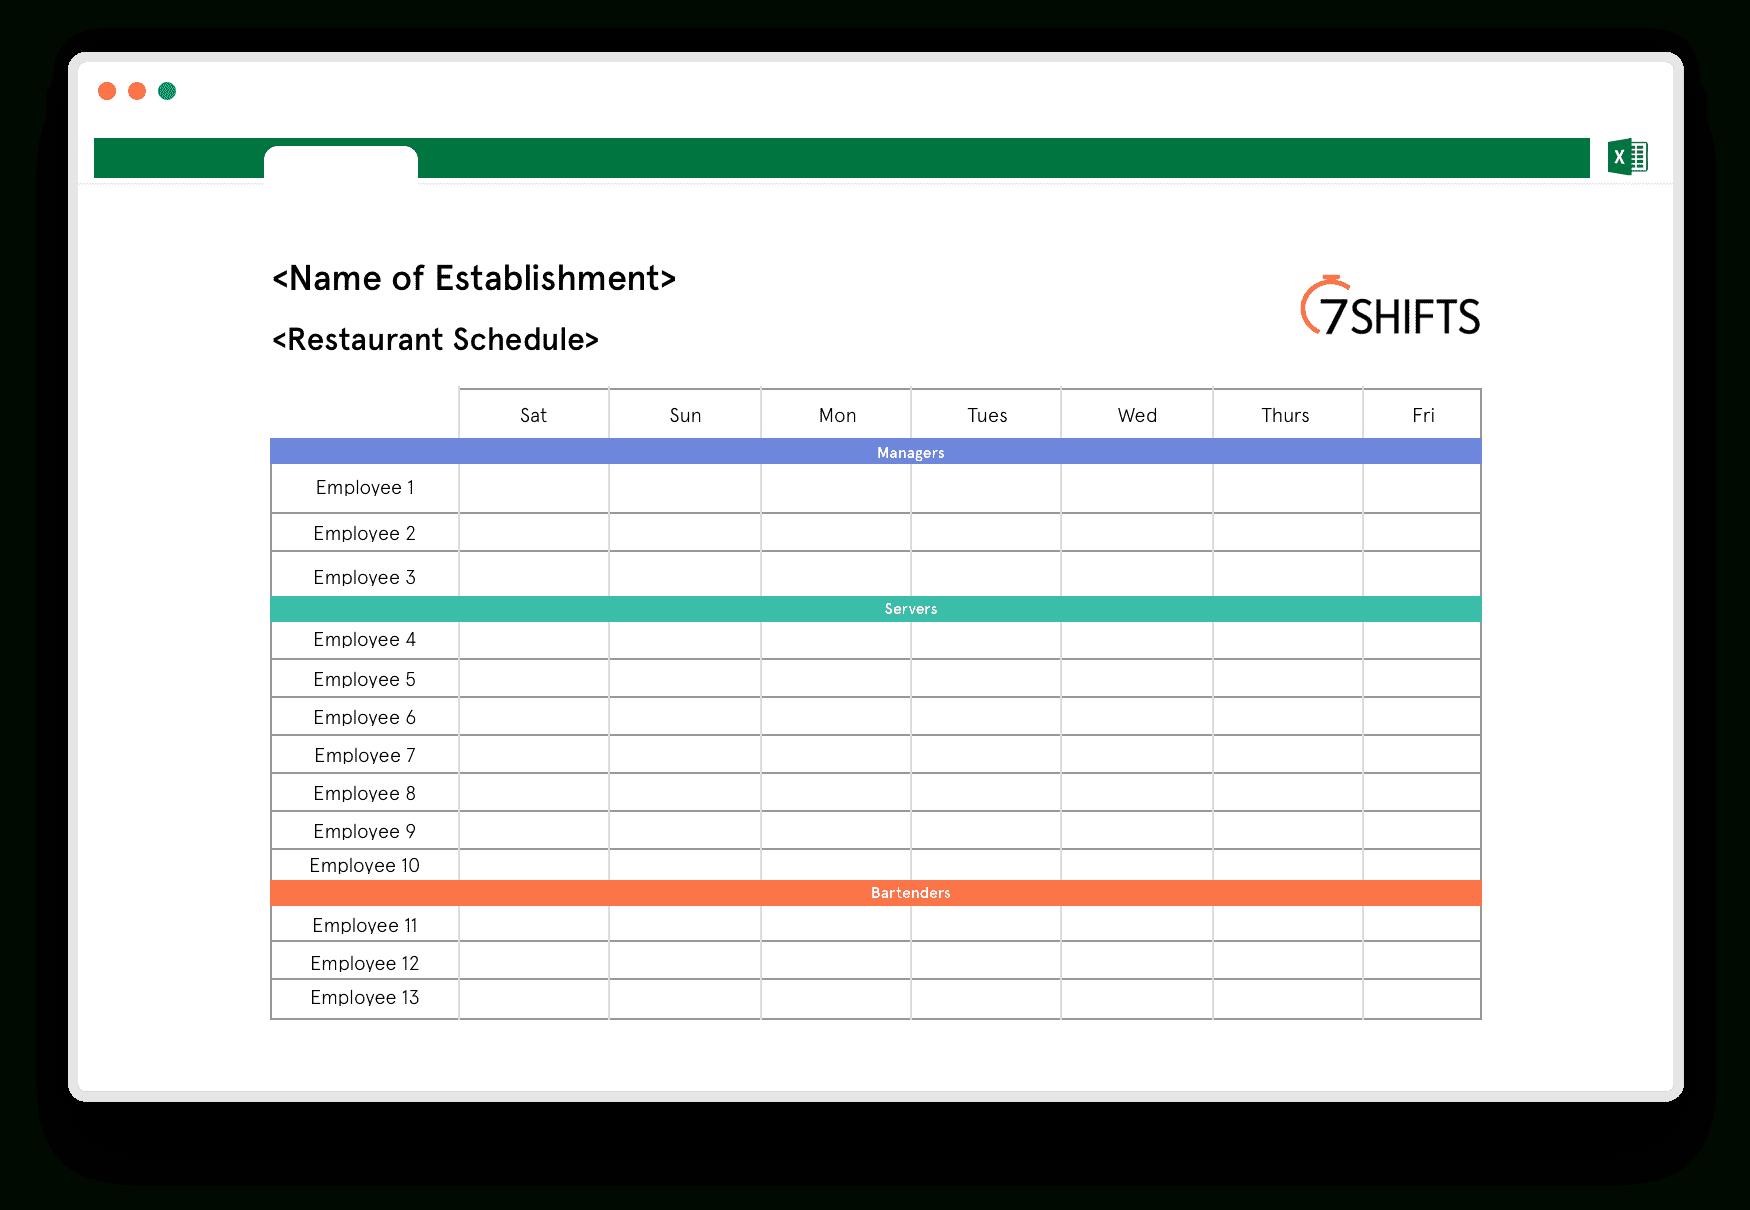 Restaurant Spreadsheets Inside Restaurant Schedule Excel